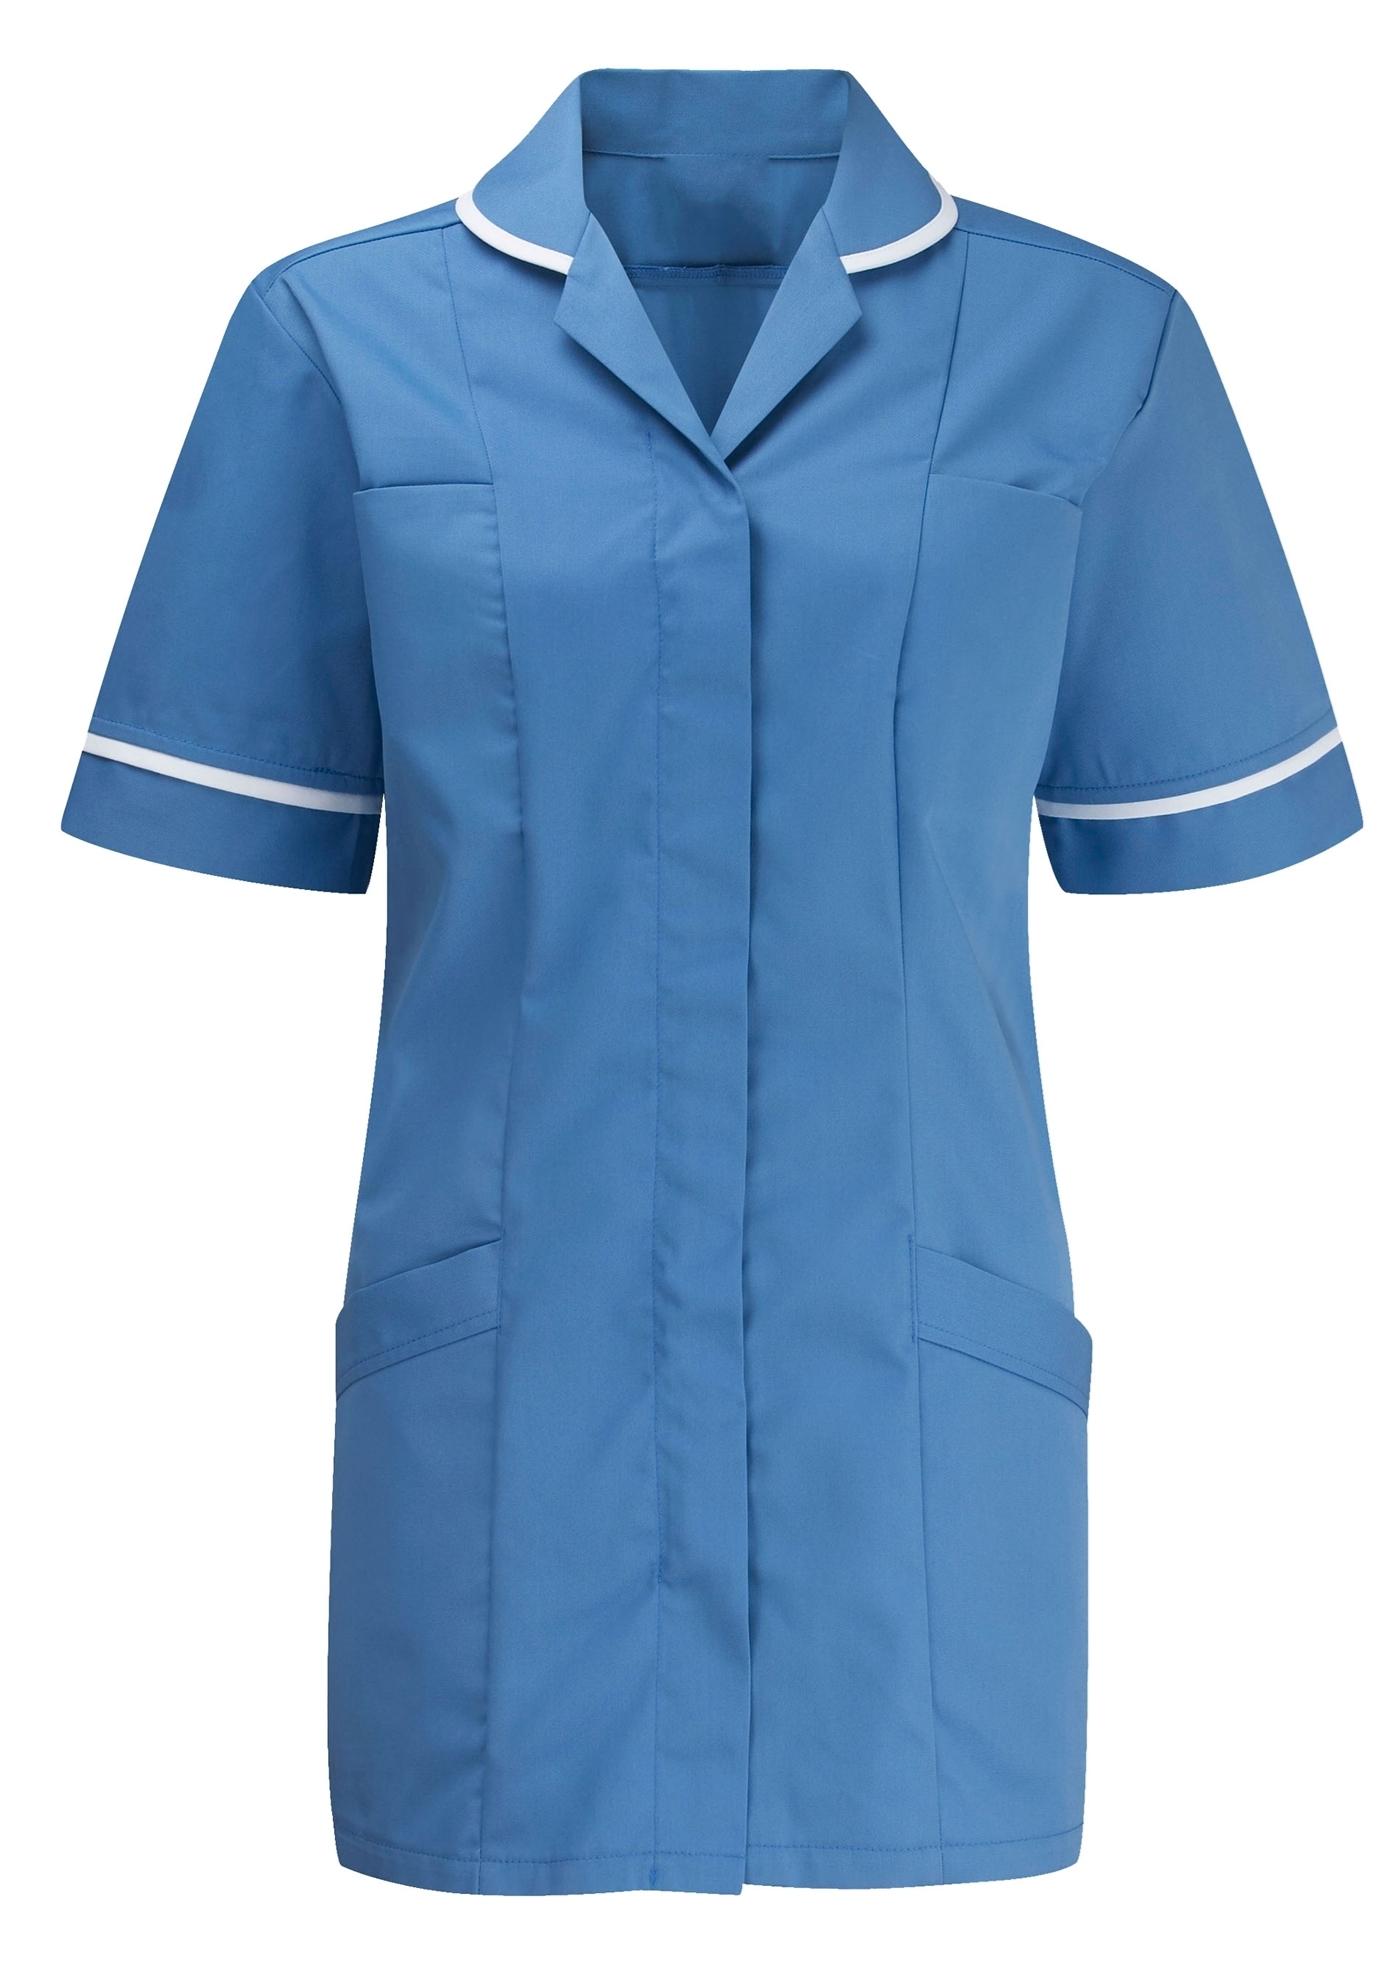 Picture of Advantage Tunic - Hospital Blue/White